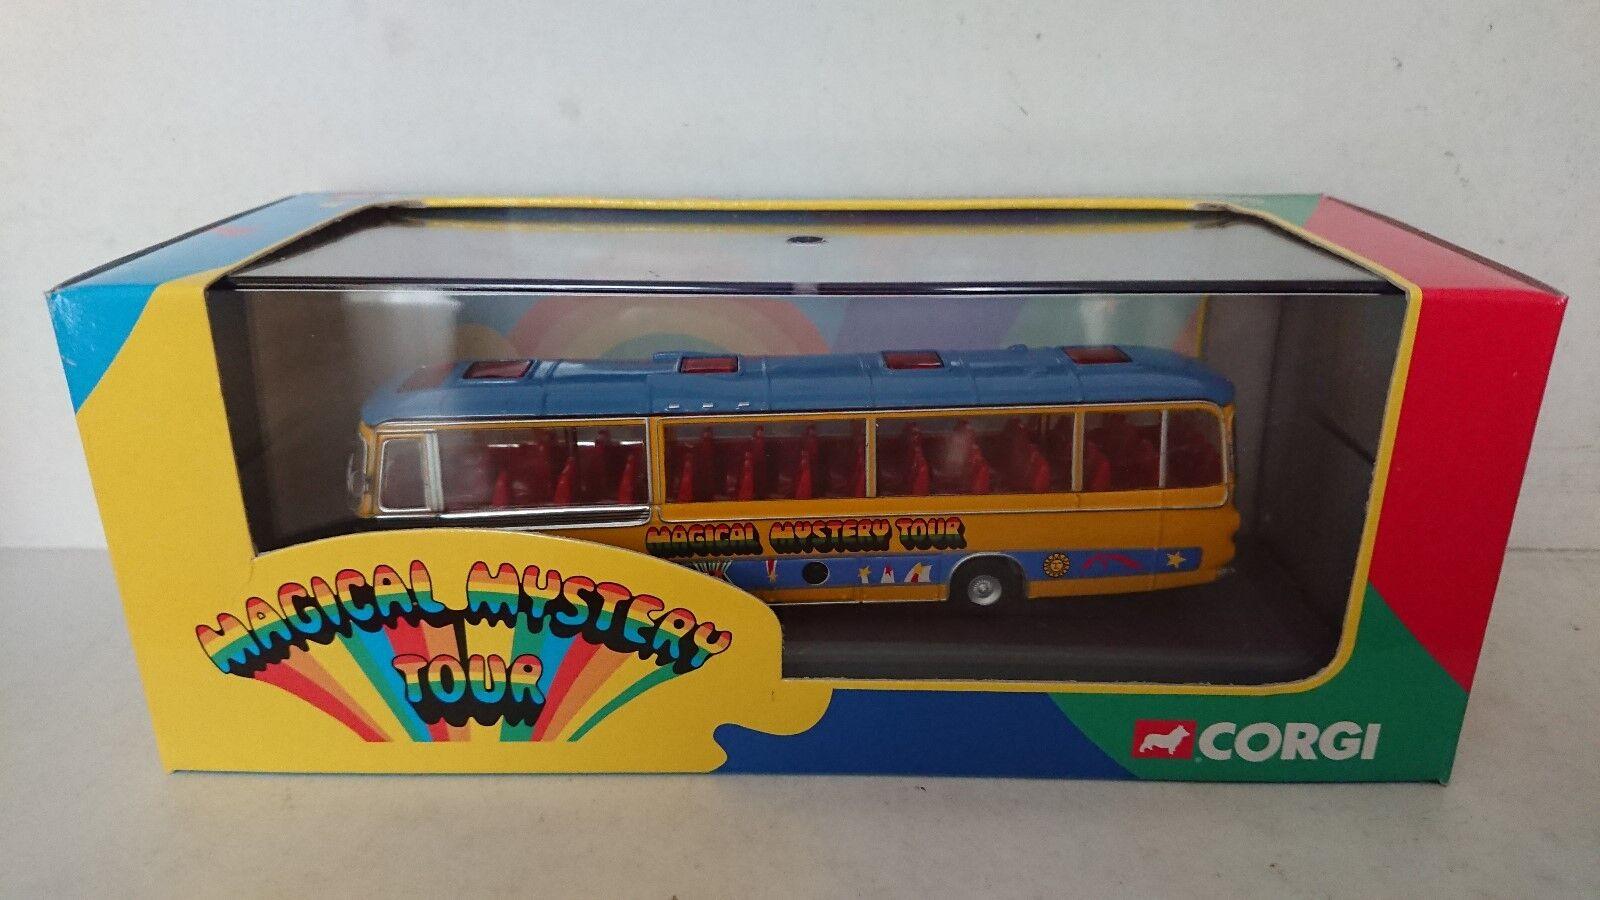 RARE Corgi 42403 The Beatles Bedford VAL Panorama Magical Mystery Tour Bus